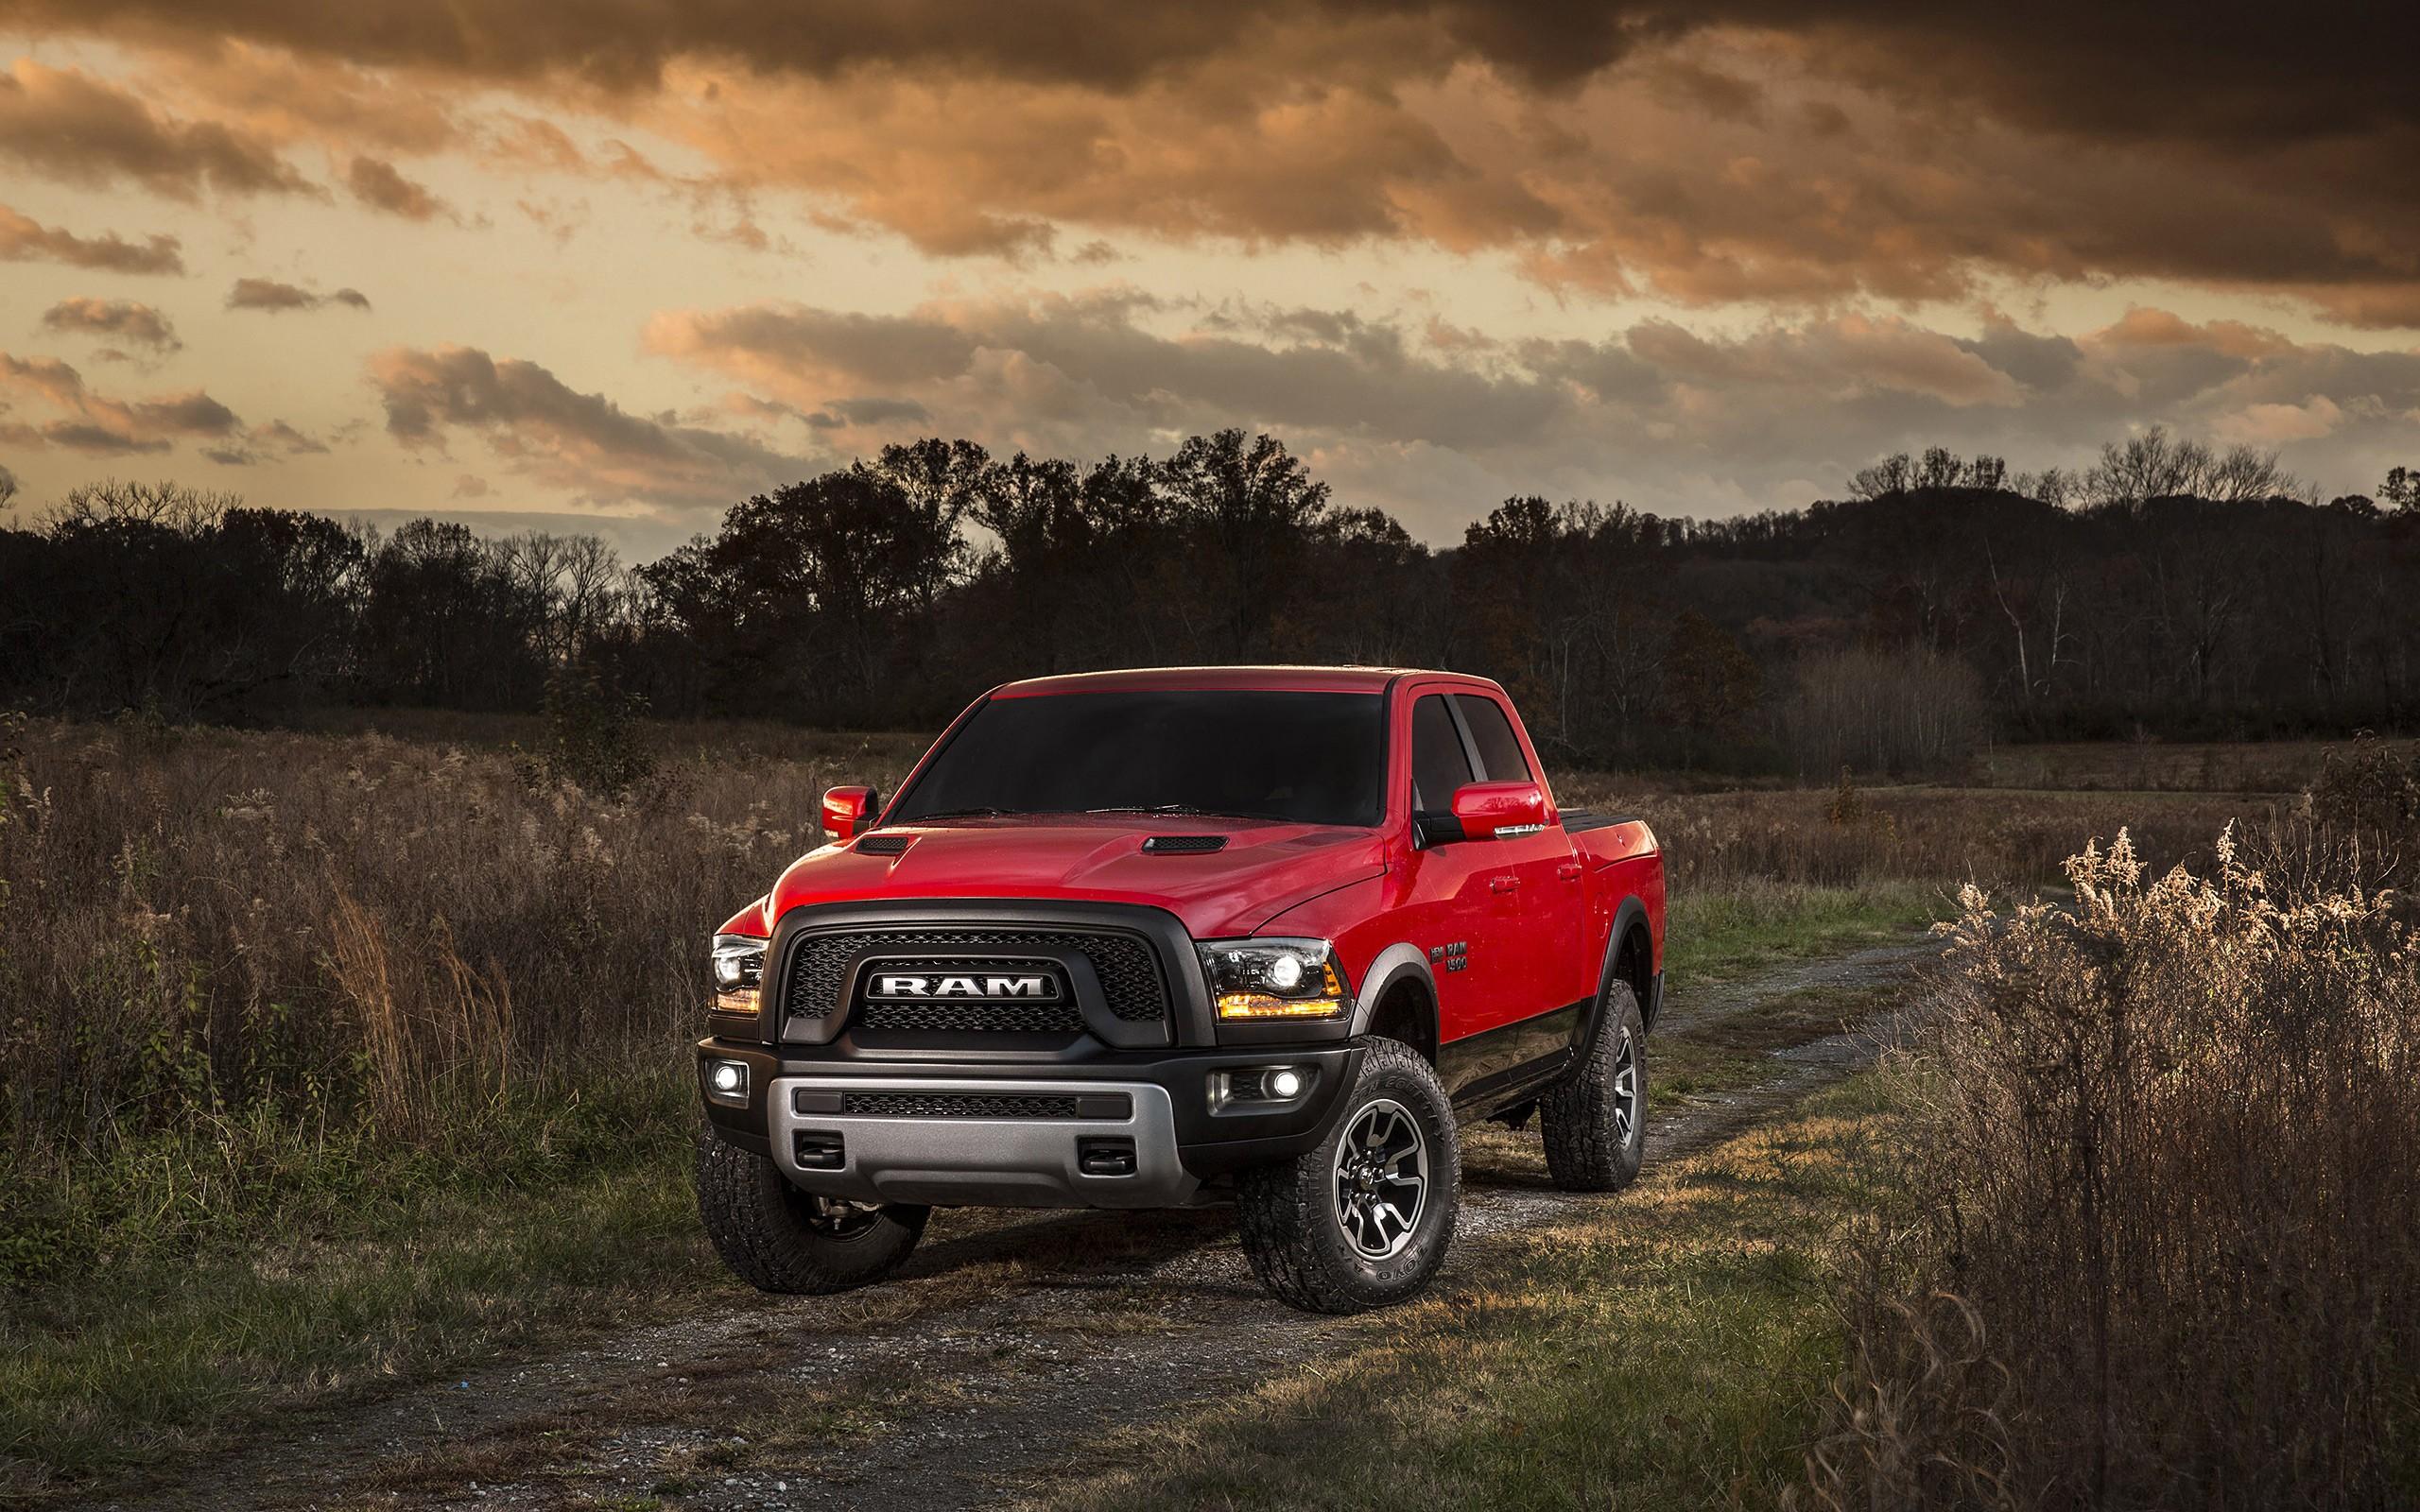 car Dodge RAM Pickup Trucks Forest 4x4 Dirt Road Wallpapers 2560x1600